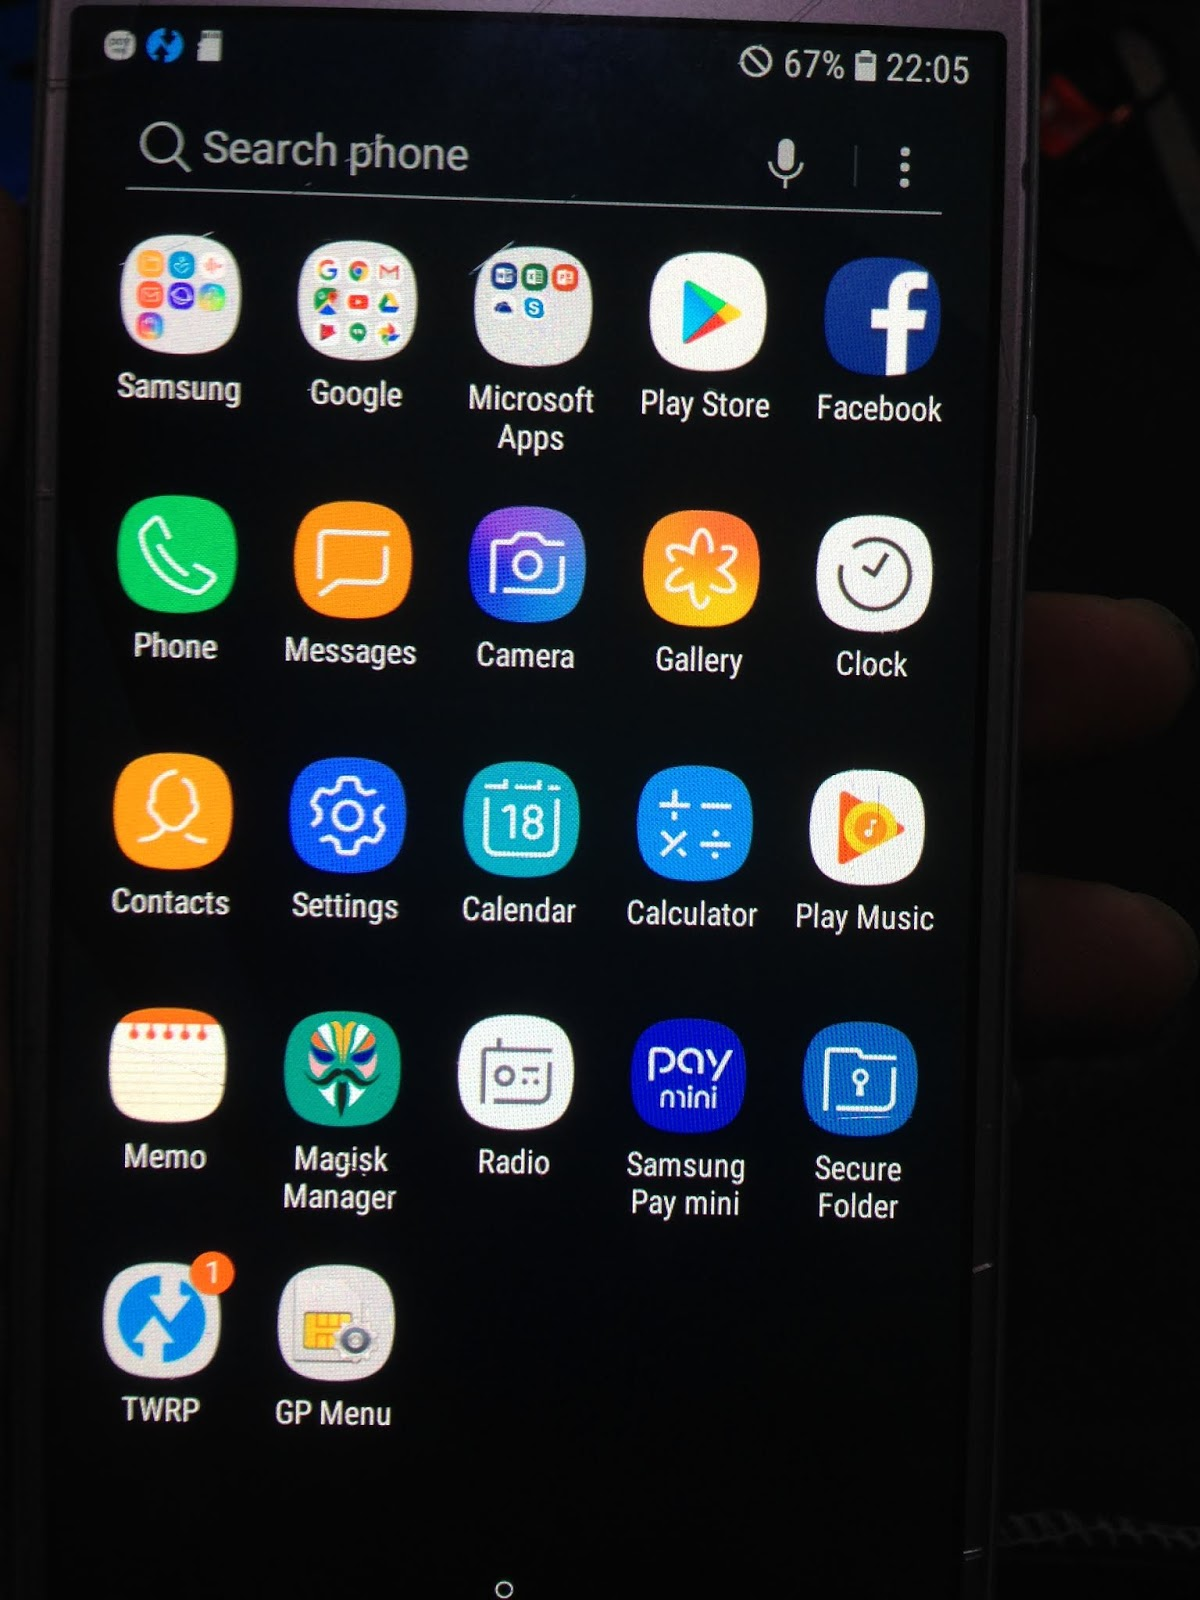 Samsung J710F root file download 8 1 0 latest version U5 100